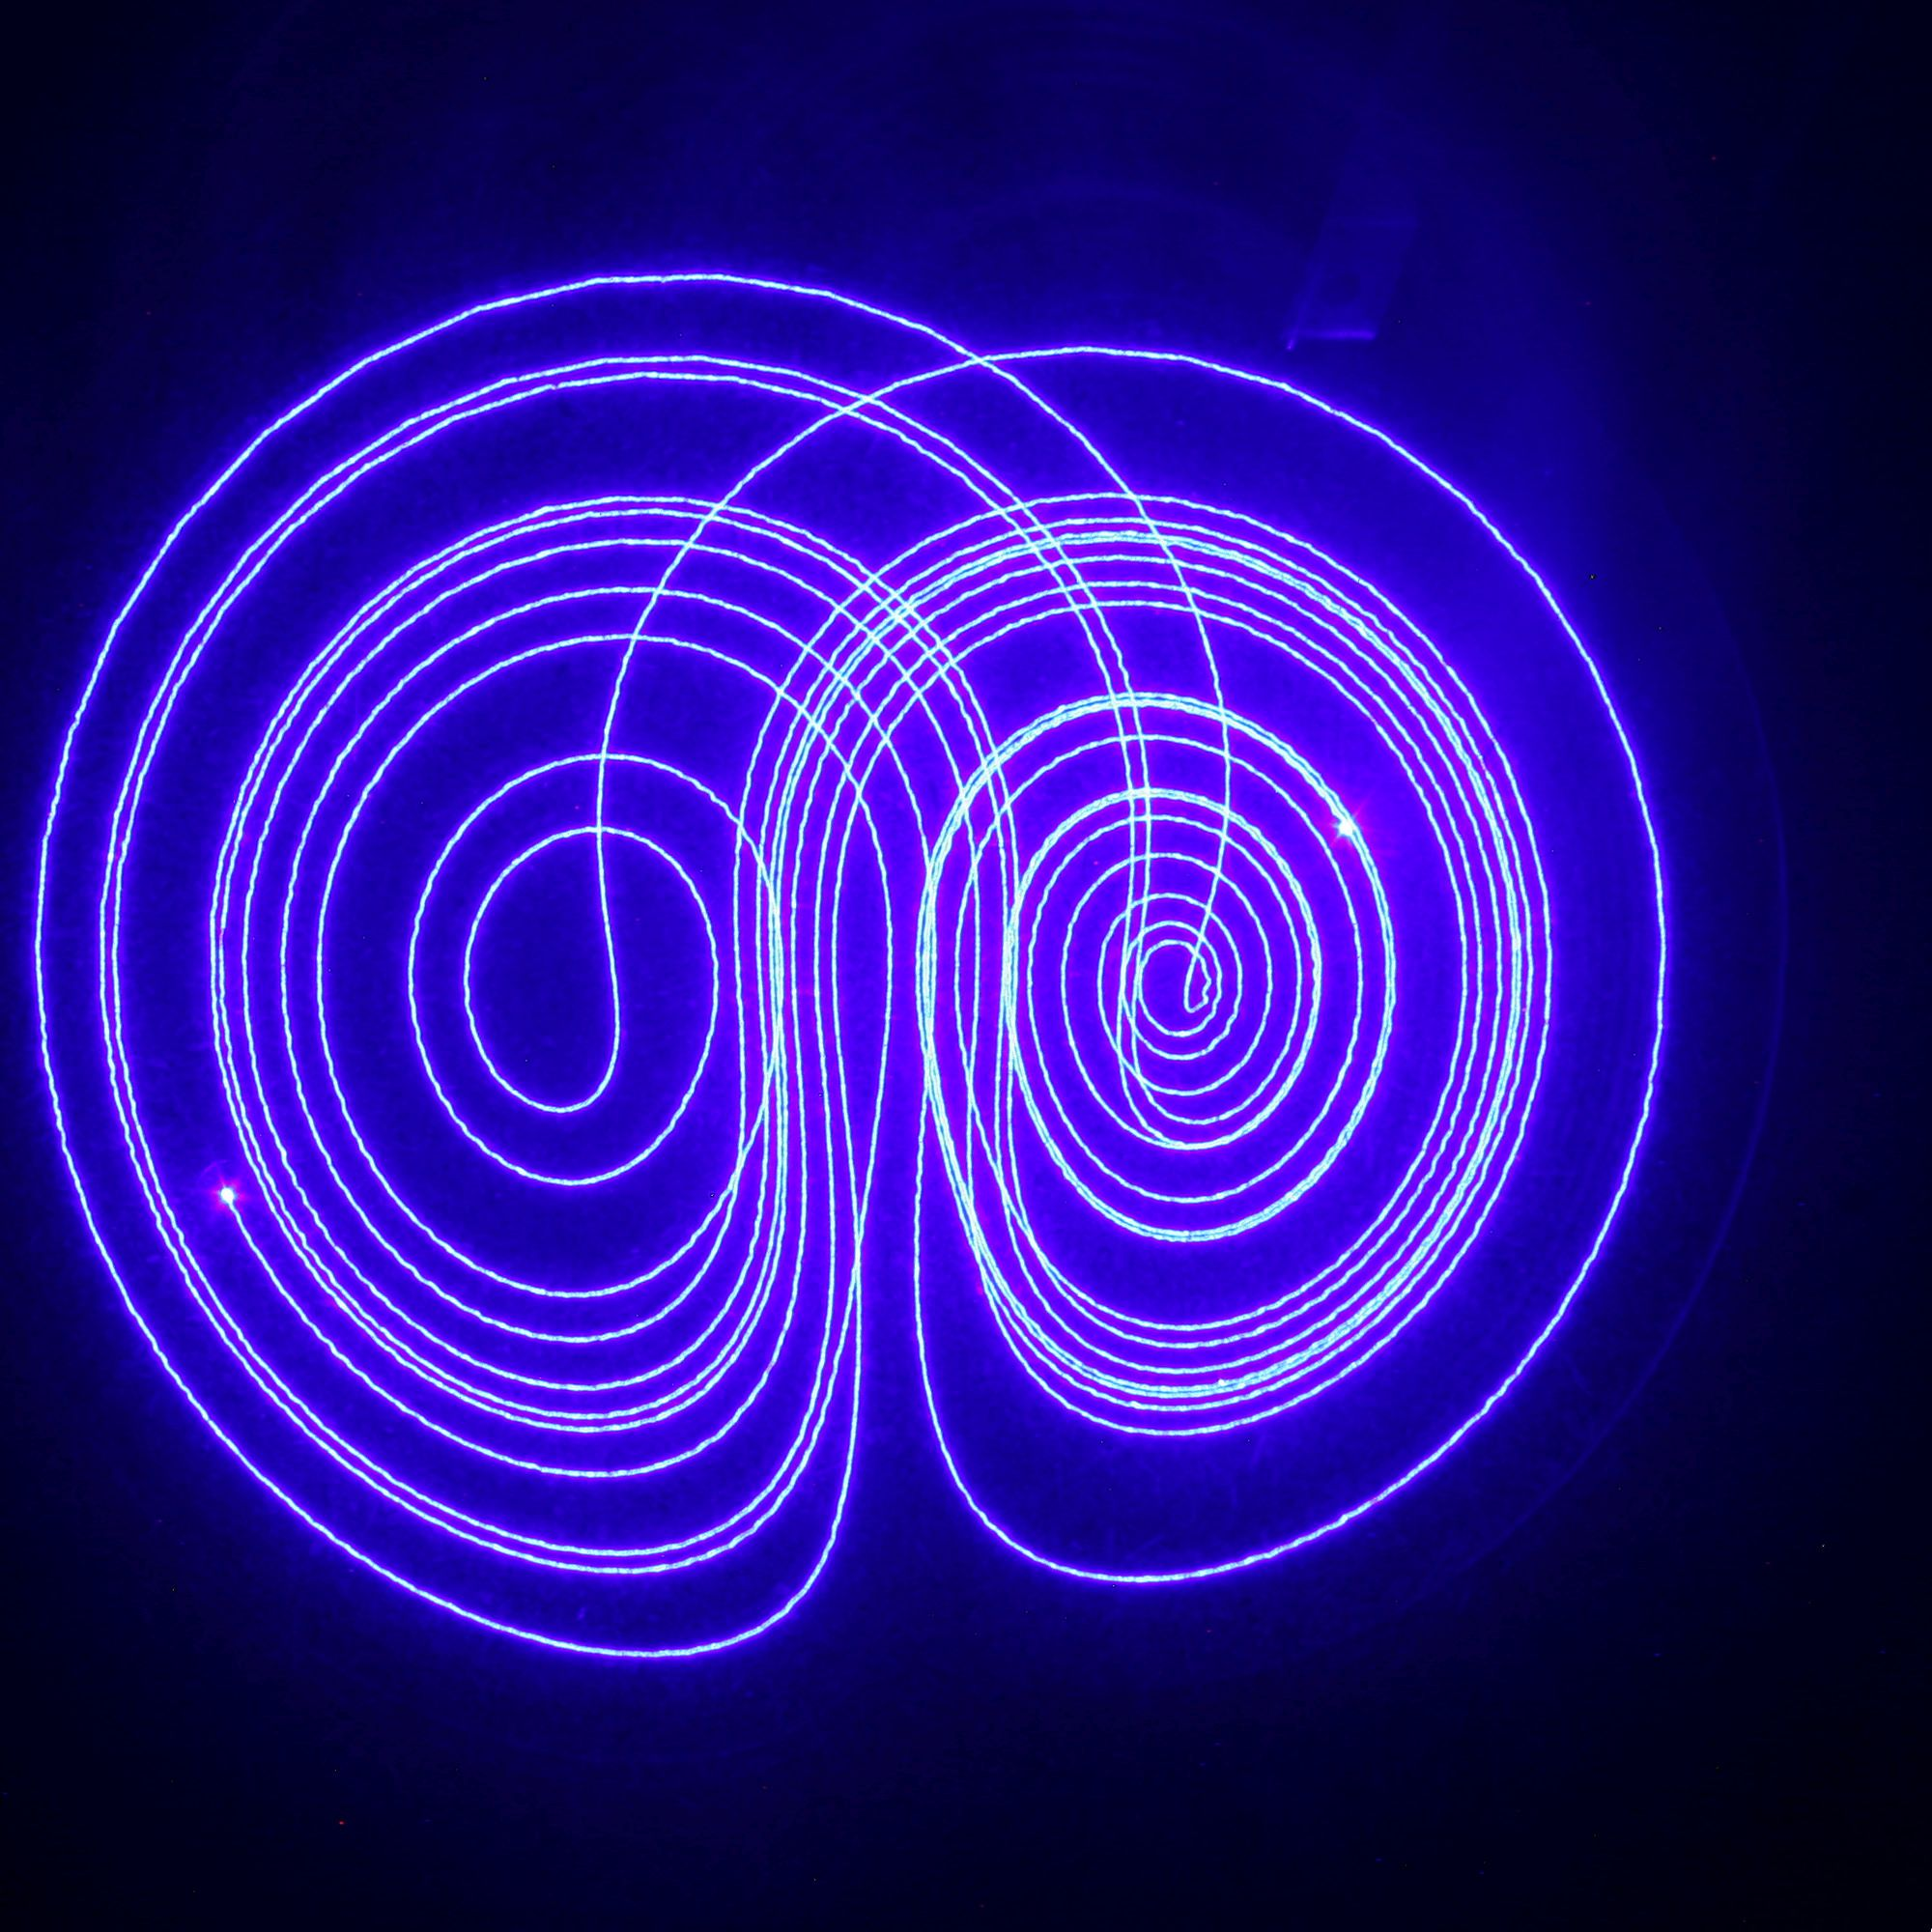 AxiDraw Lorenz attractor